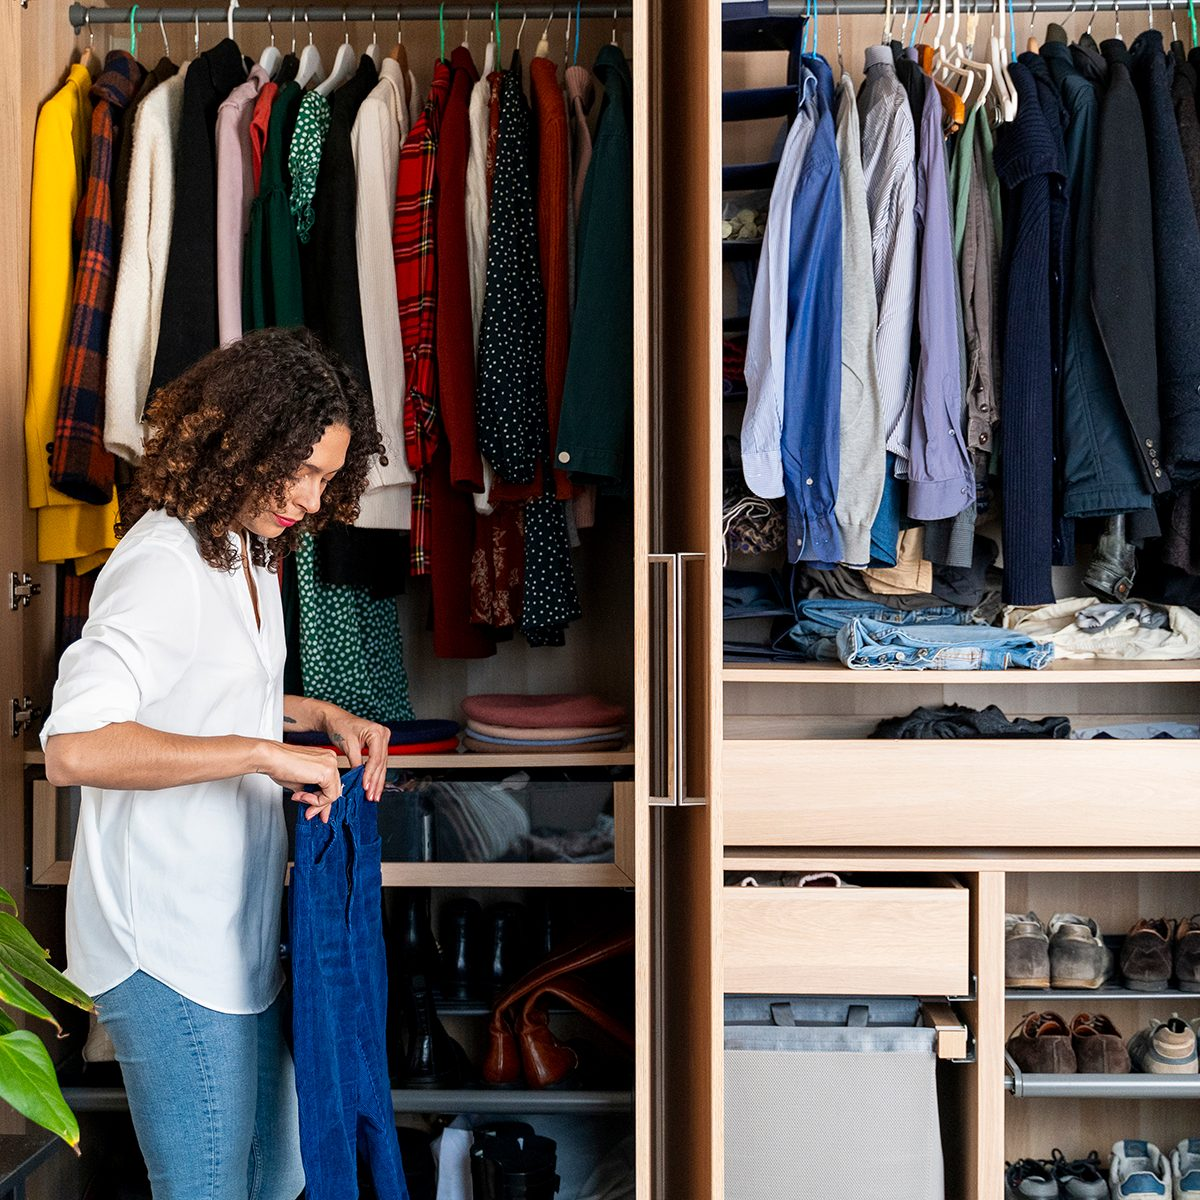 Italy, Tuscany, Florence, couple fixing the closet